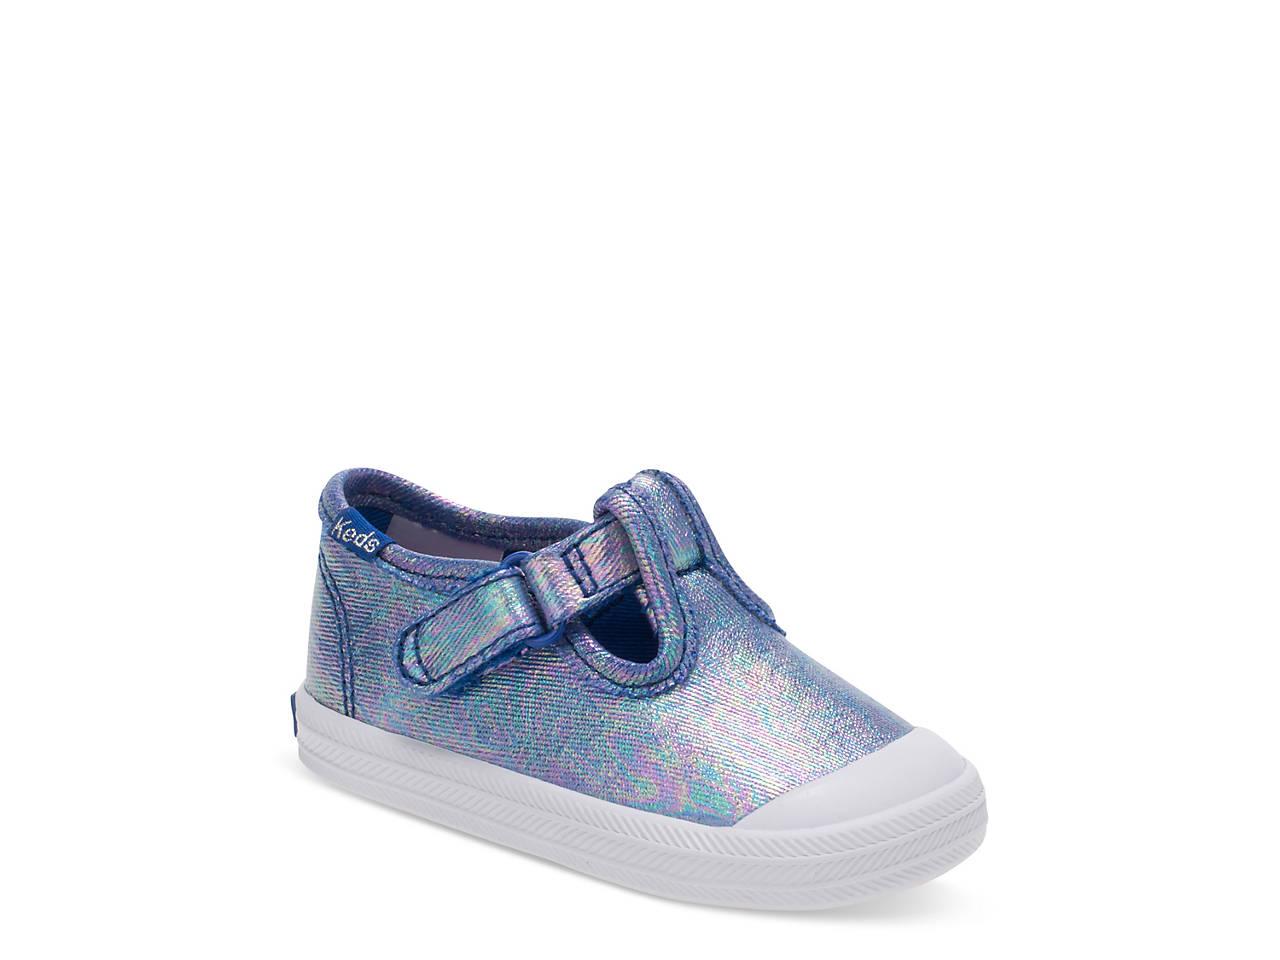 a674a773e Keds Champion Infant Sneaker Kids Shoes